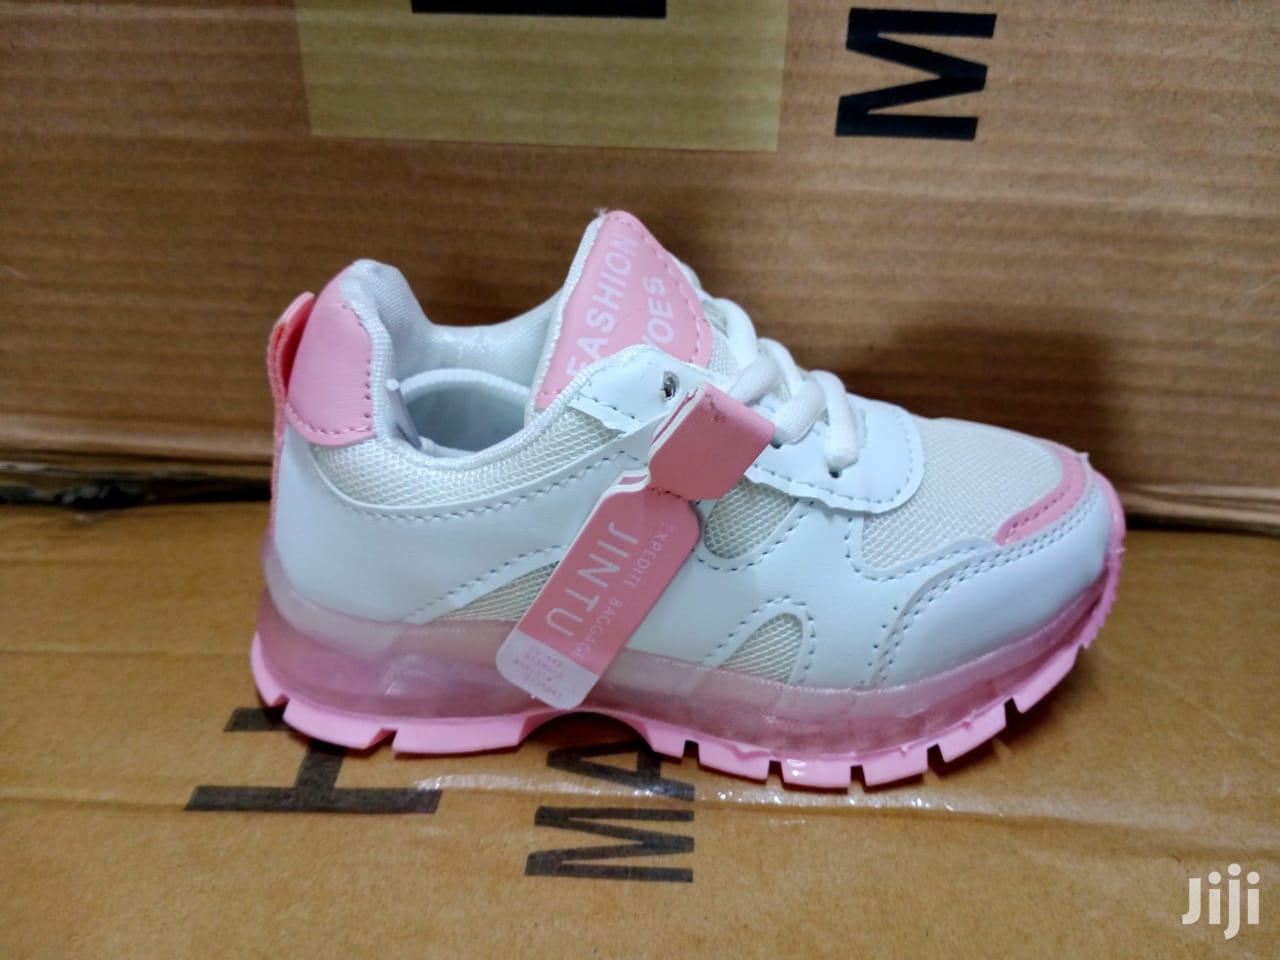 Girls Sneakers | Children's Shoes for sale in Embakasi, Nairobi, Kenya